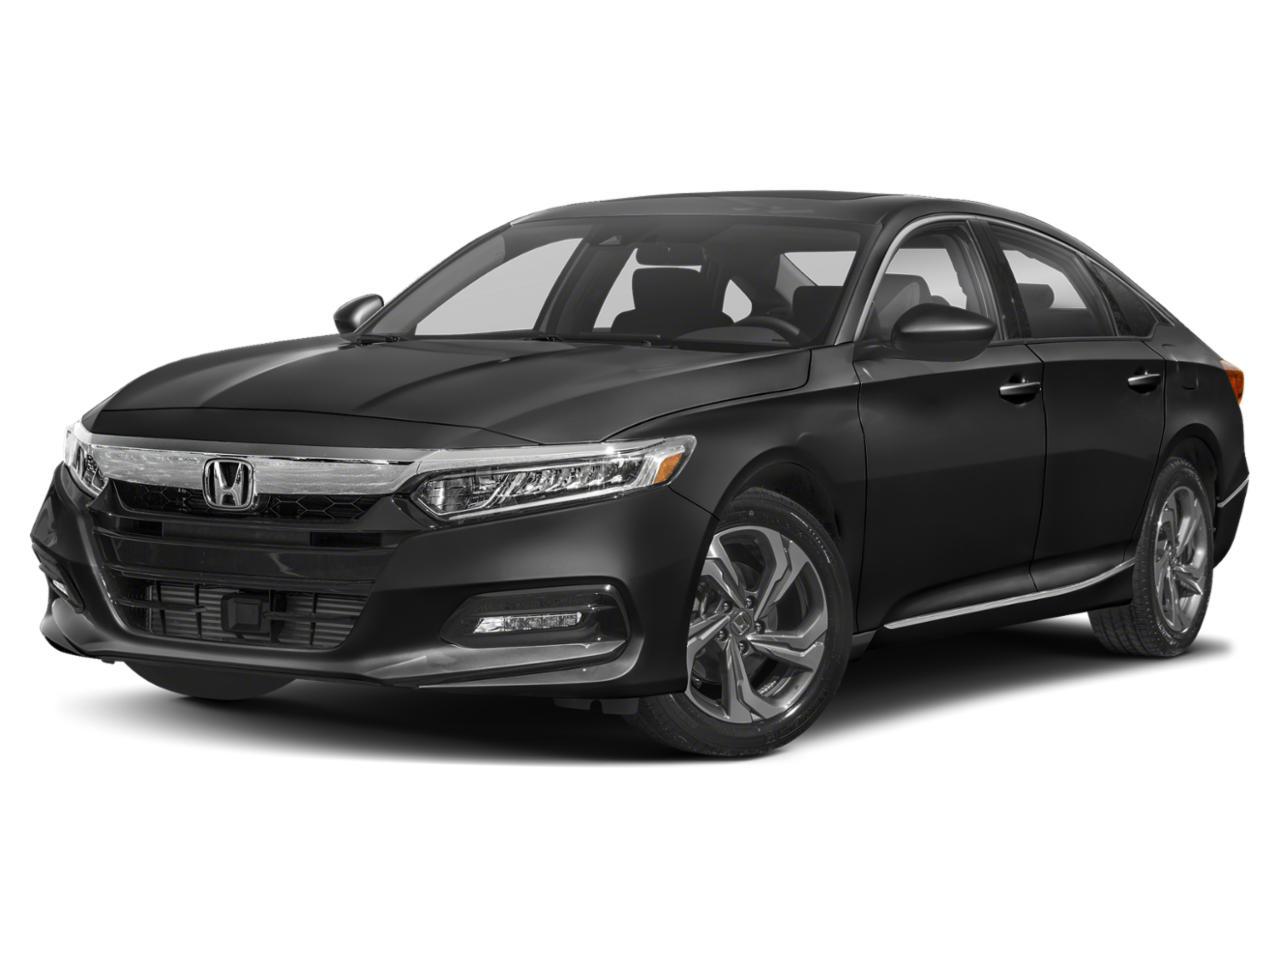 2018 Honda Accord Sedan Vehicle Photo in Midland, TX 79703